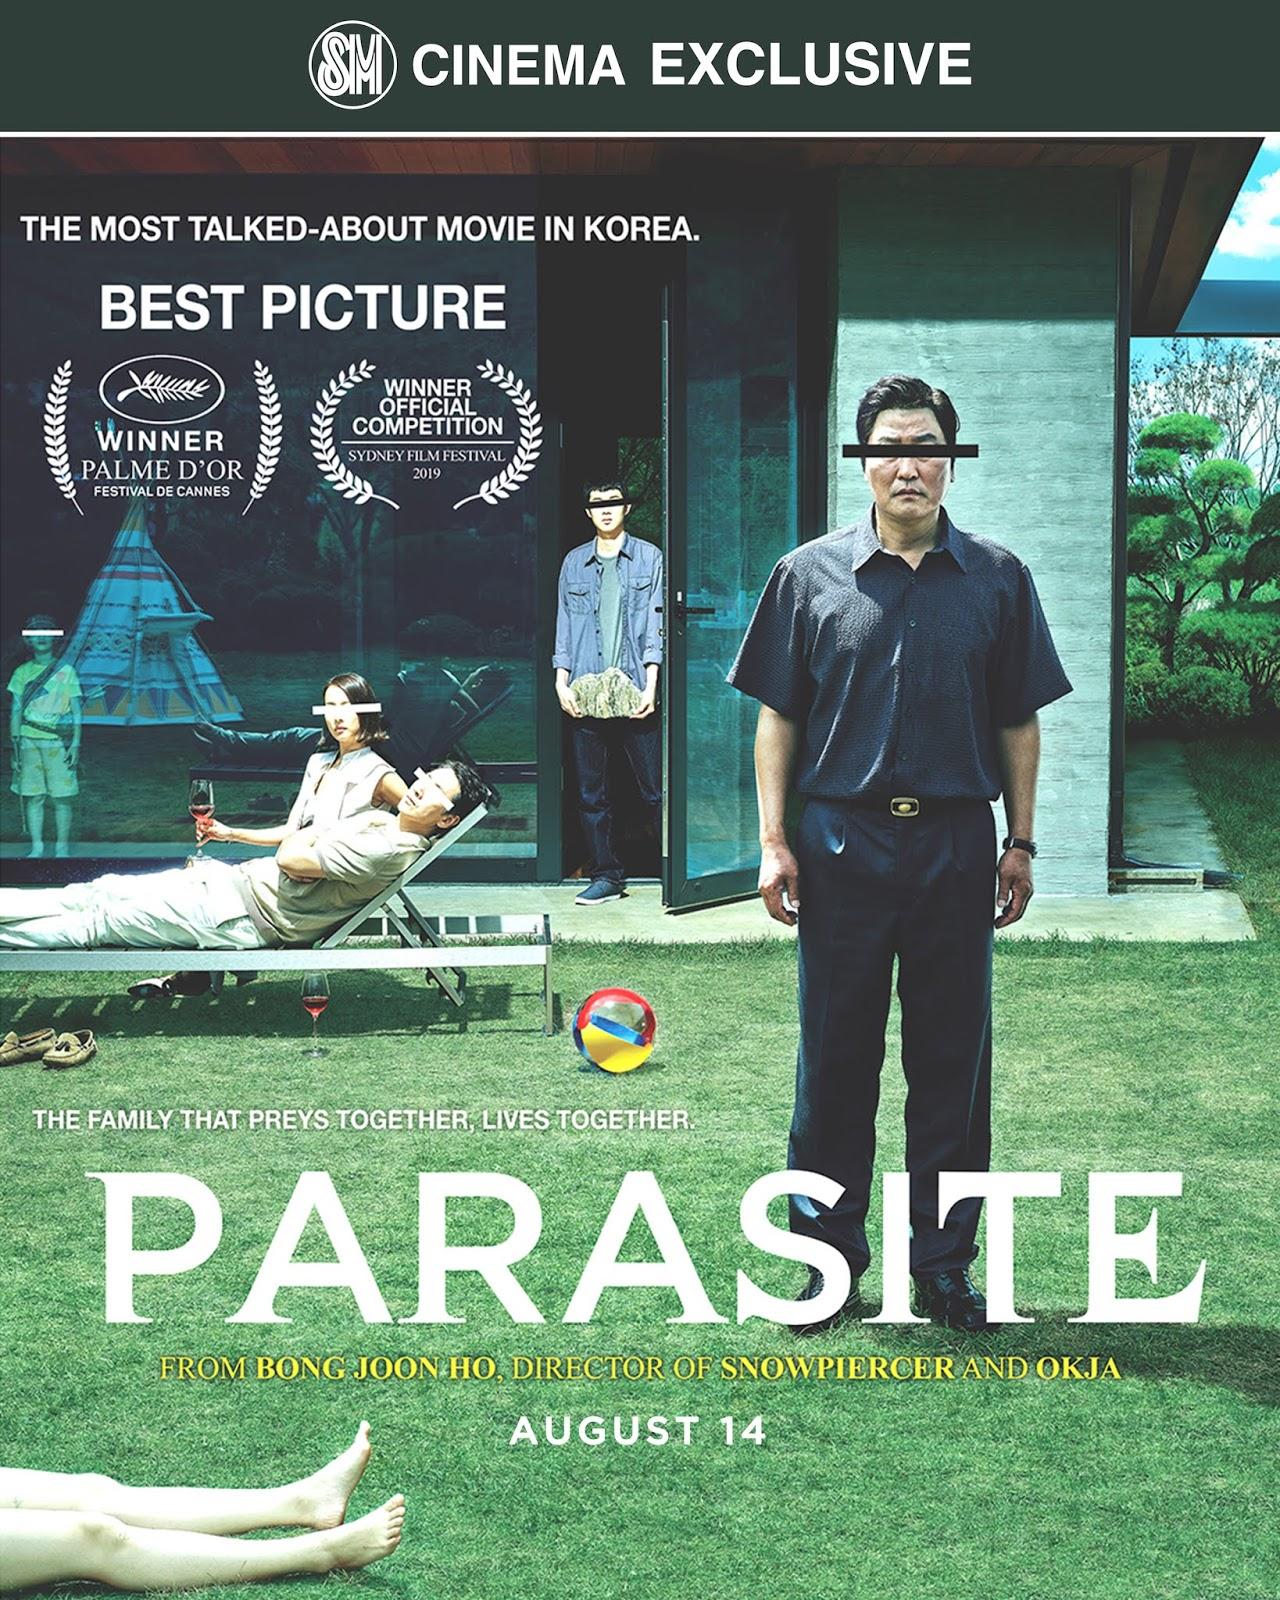 Parasite (2019) - Ruthless Reviews